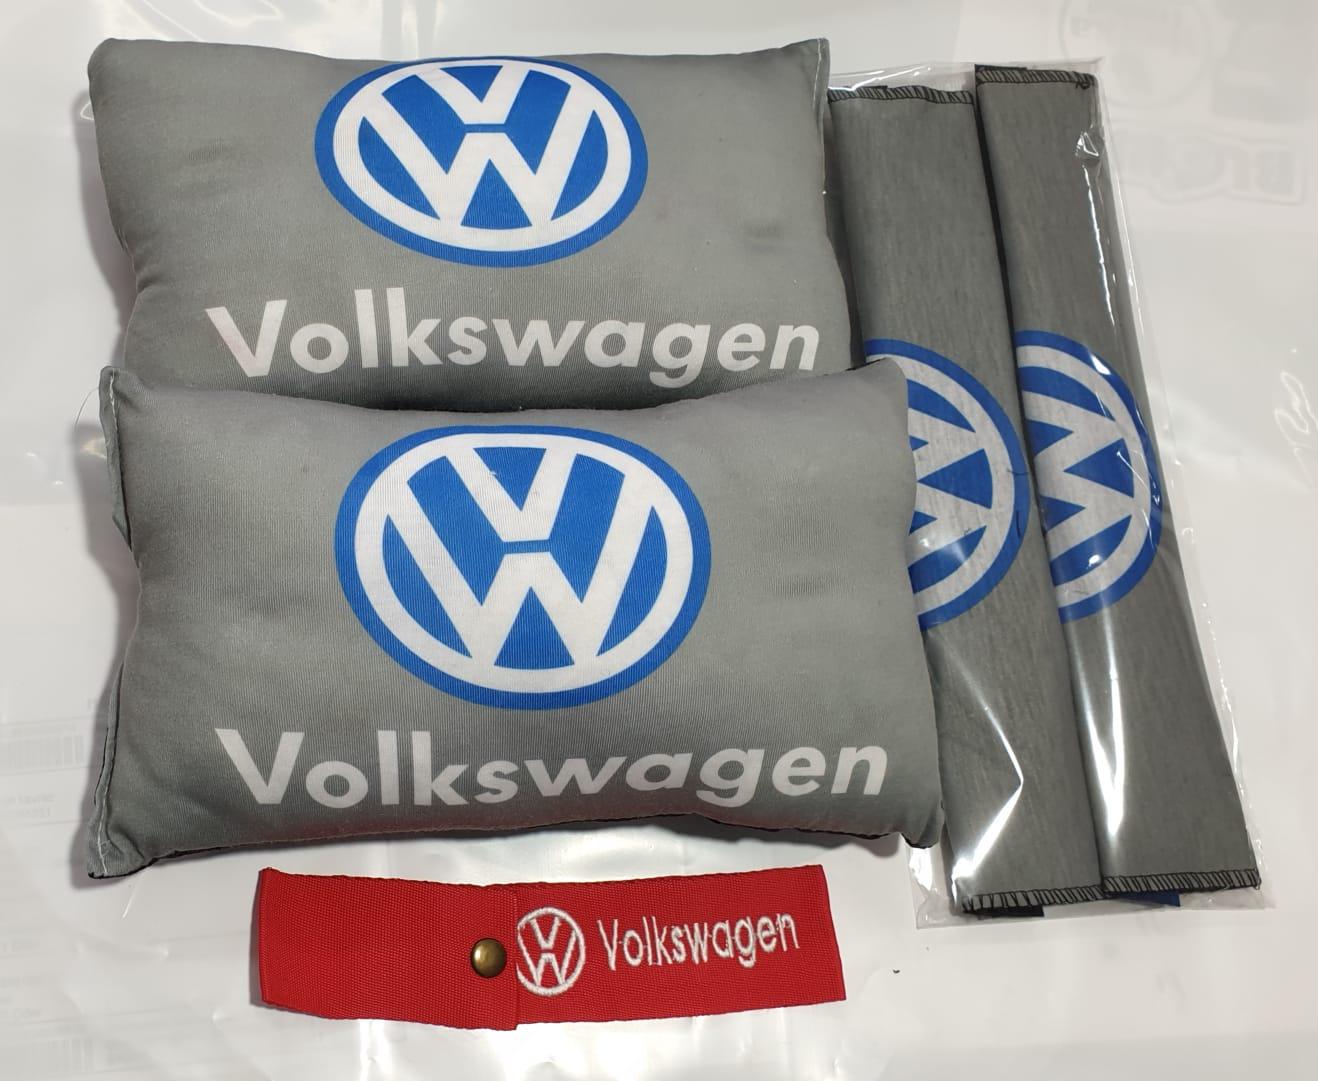 VW 2 BOYUN YASTIK 2 KEMER KILIF tampon süsü ve numaramatik parktel elyaf dolgulu konfor minder